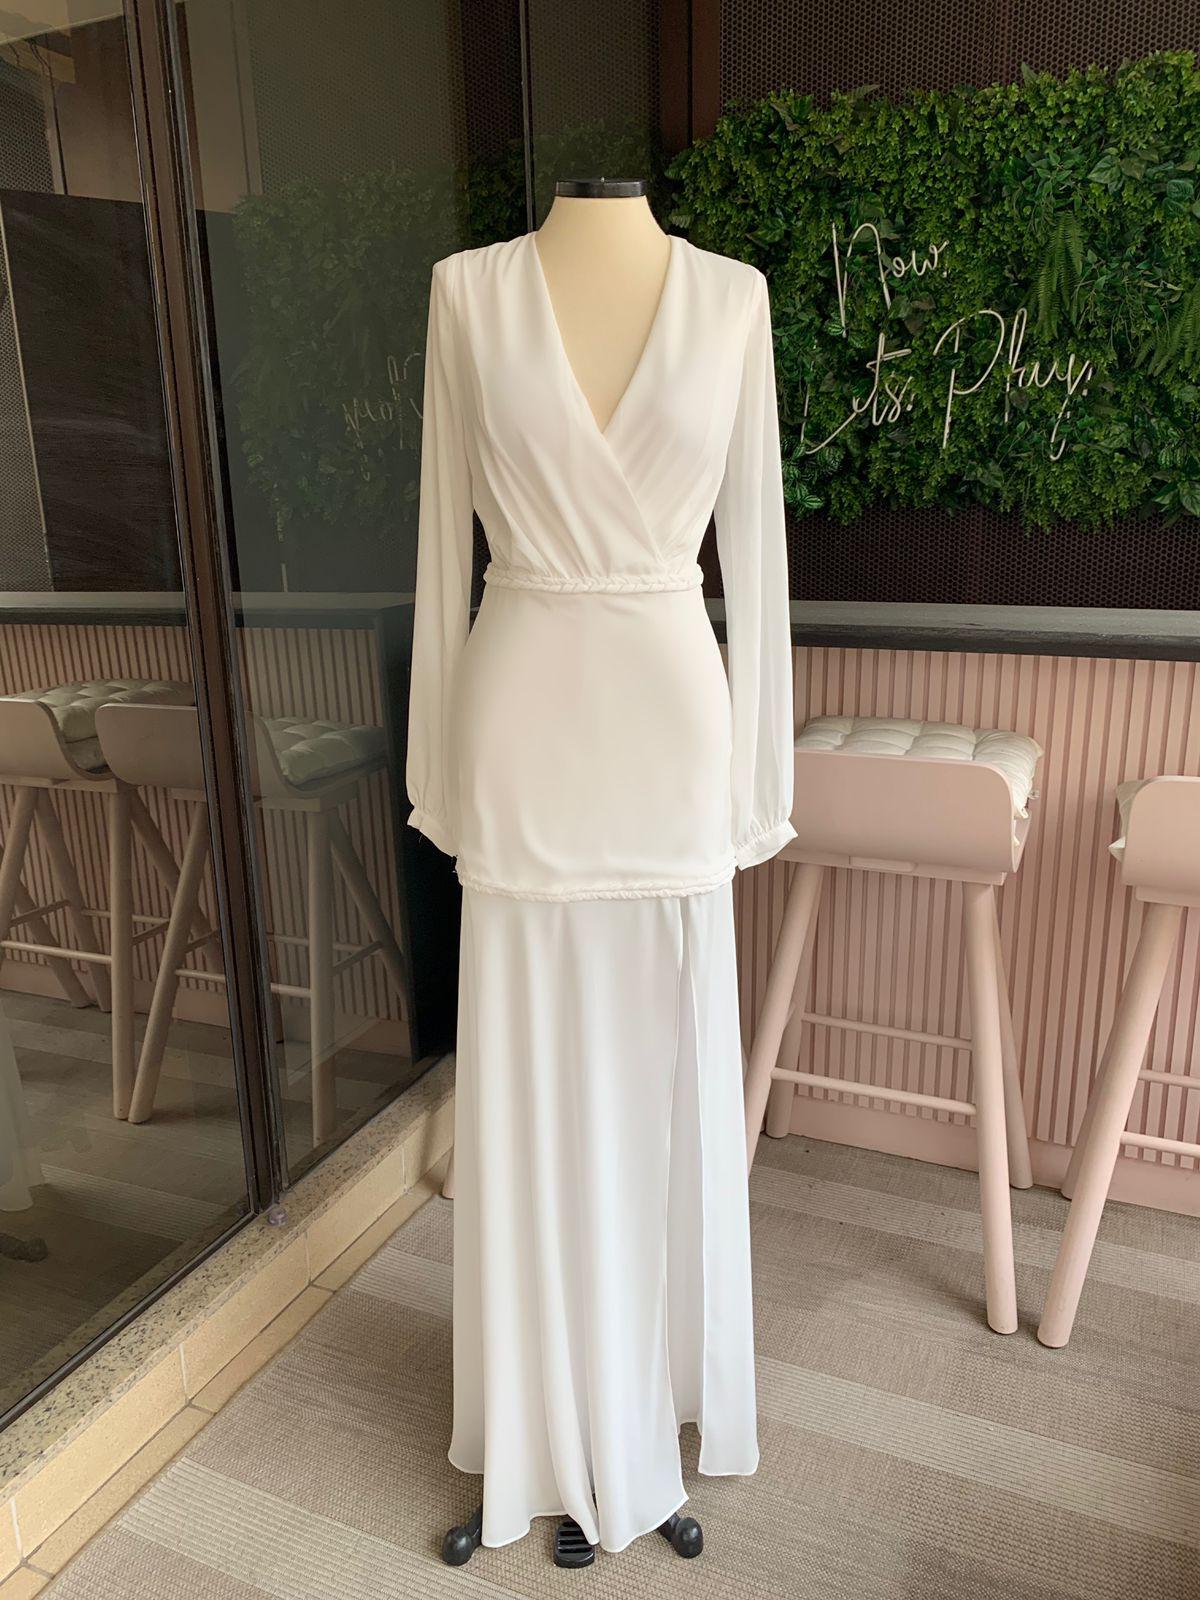 Vestido Minas Gerais Branco